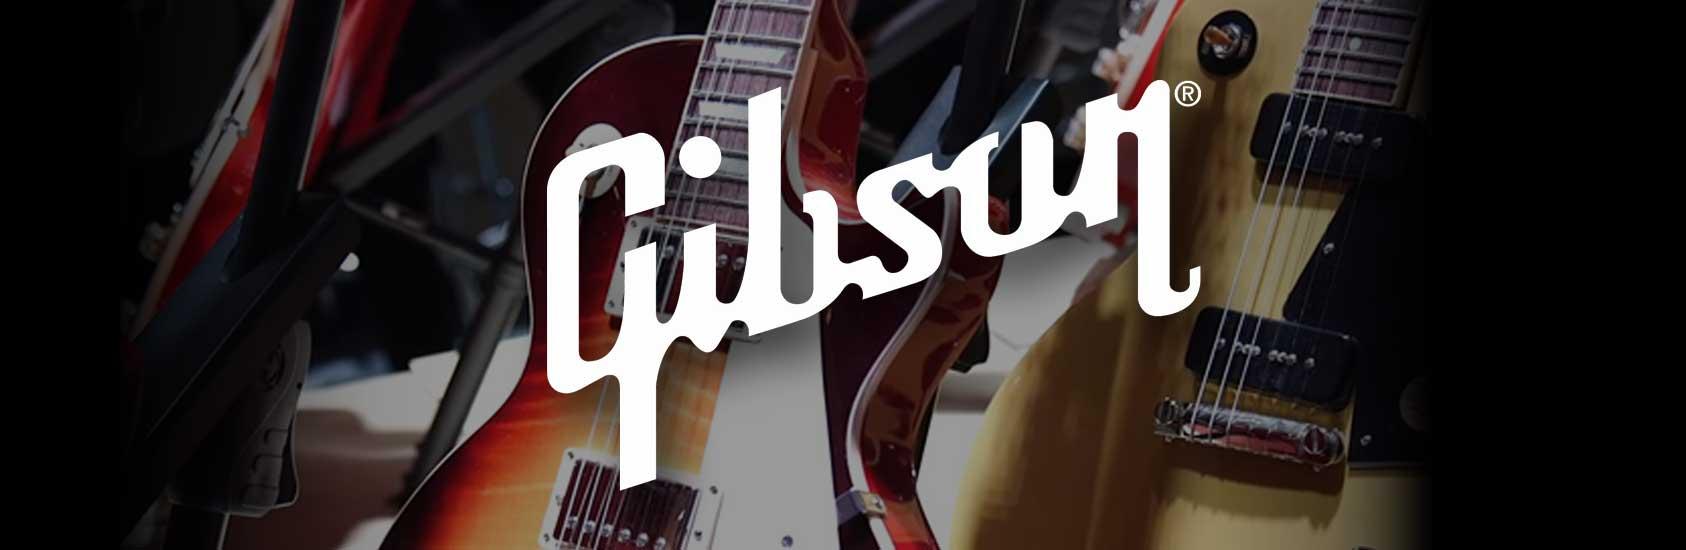 Gibson Unveil Fresh Guitar Range at NAMM 2019 - Andertons